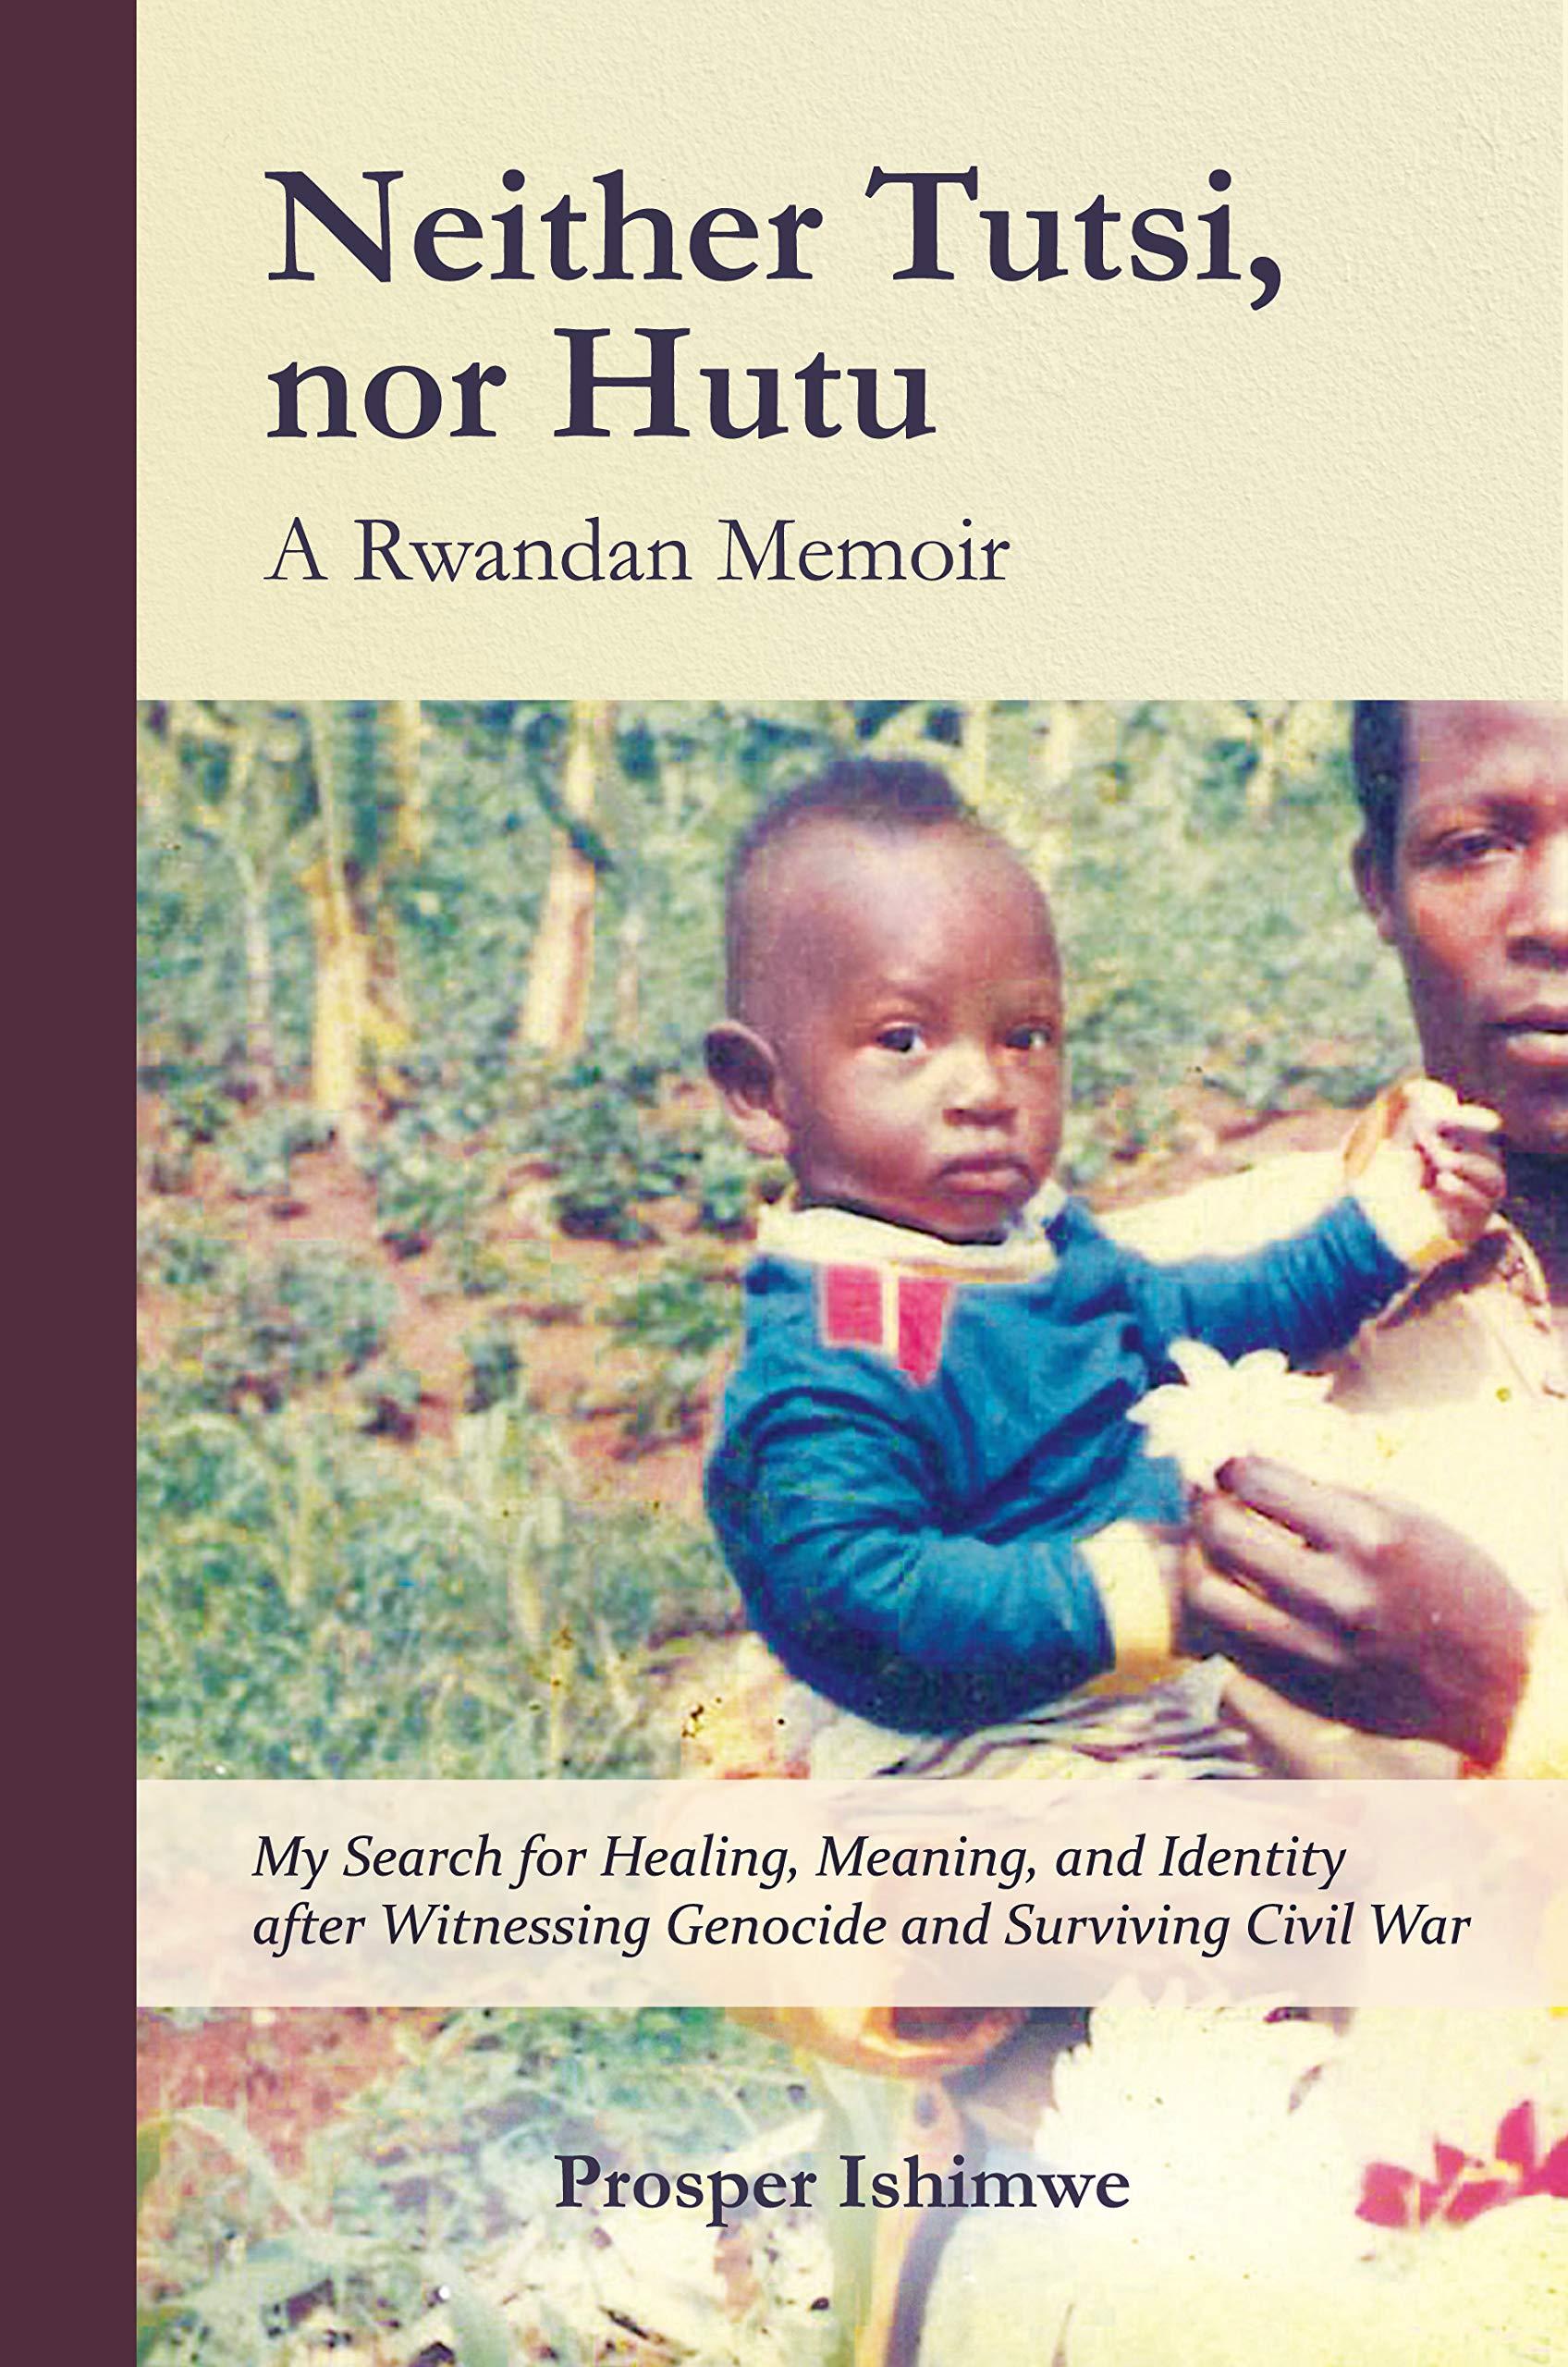 Neither Tutsi, Nor Hutu: A Rwandan Memoir: Search for Healing Meaning & Identity after Witnessing Genocide & Civil War (Rwandan Memoirs Book 1)